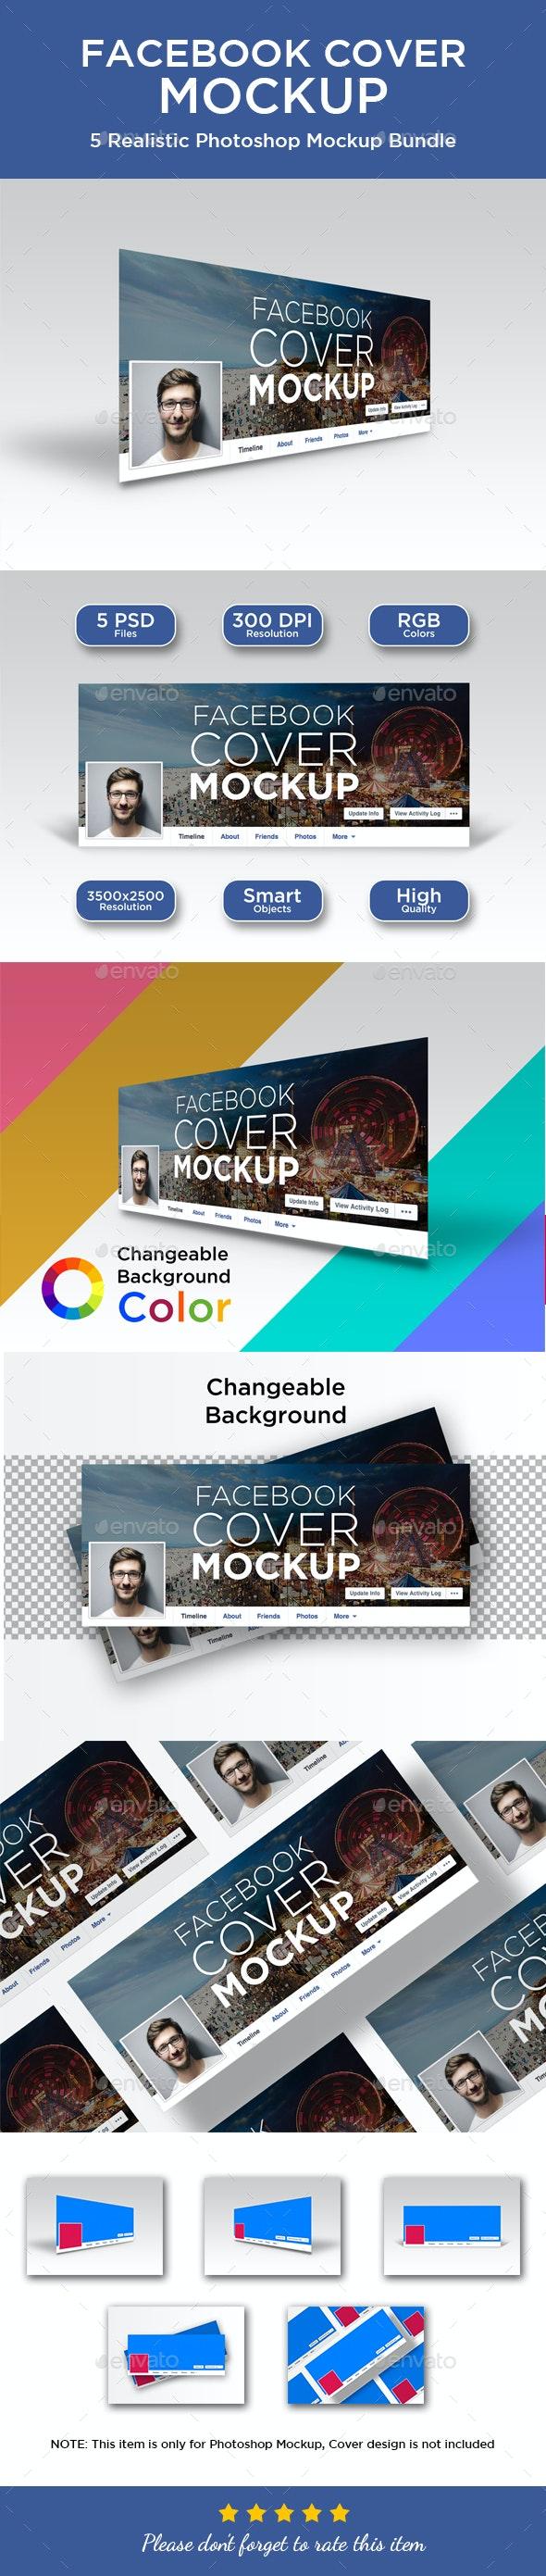 Facebook Cover Mockup by graphicdesigno | GraphicRiver